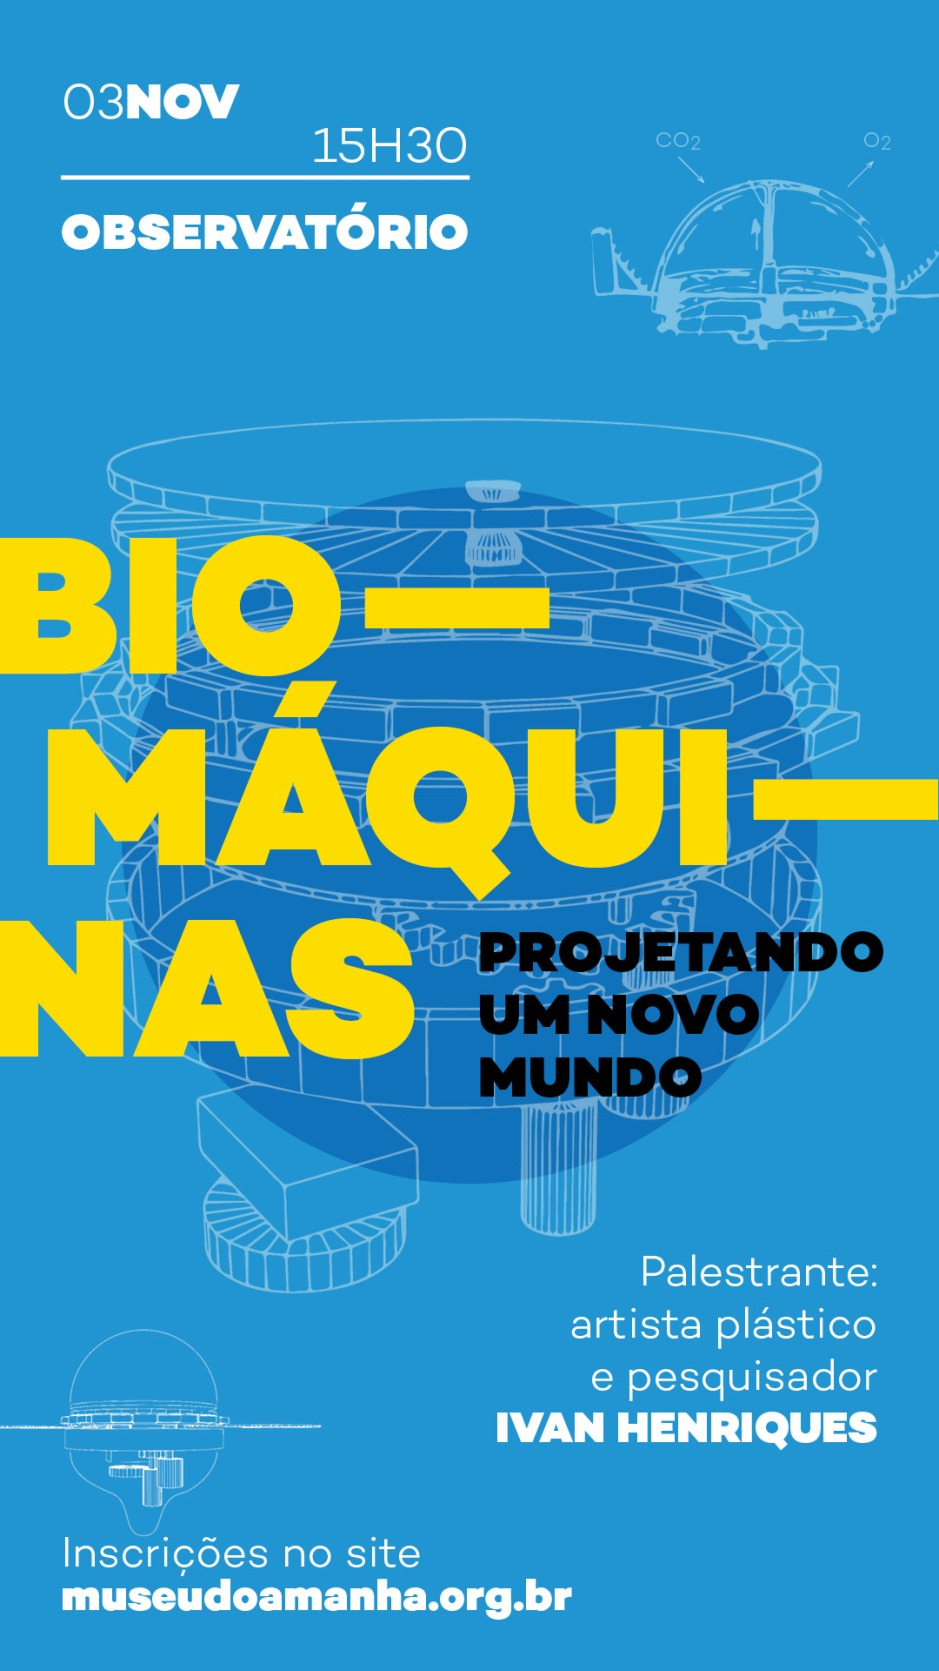 mda_obs_biomaquina_tela_atrio_161028_2.jpg